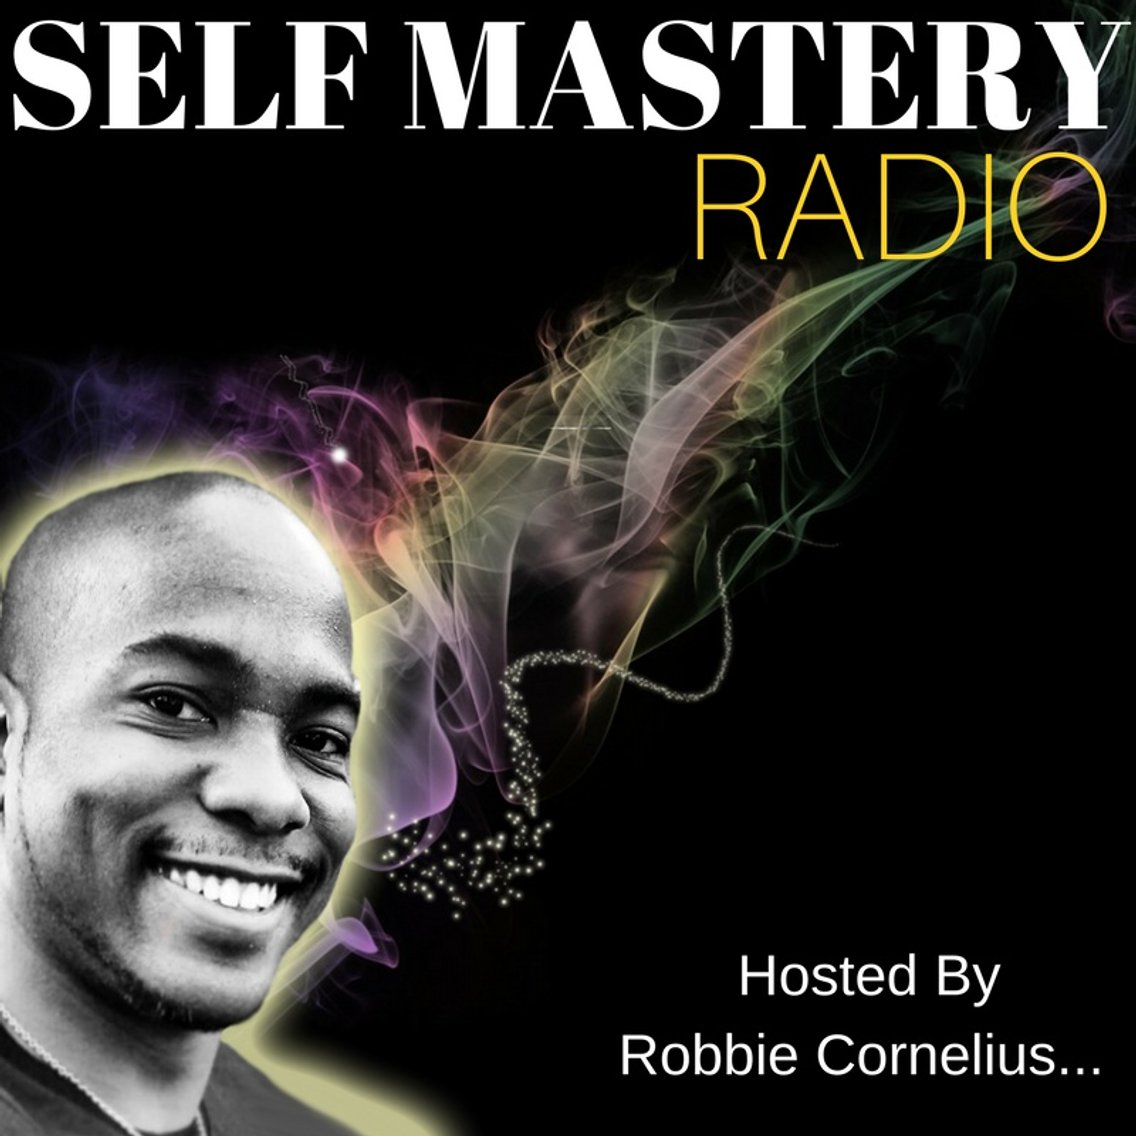 Self Mastery Radio with Robbie Cornelius - Cover Image